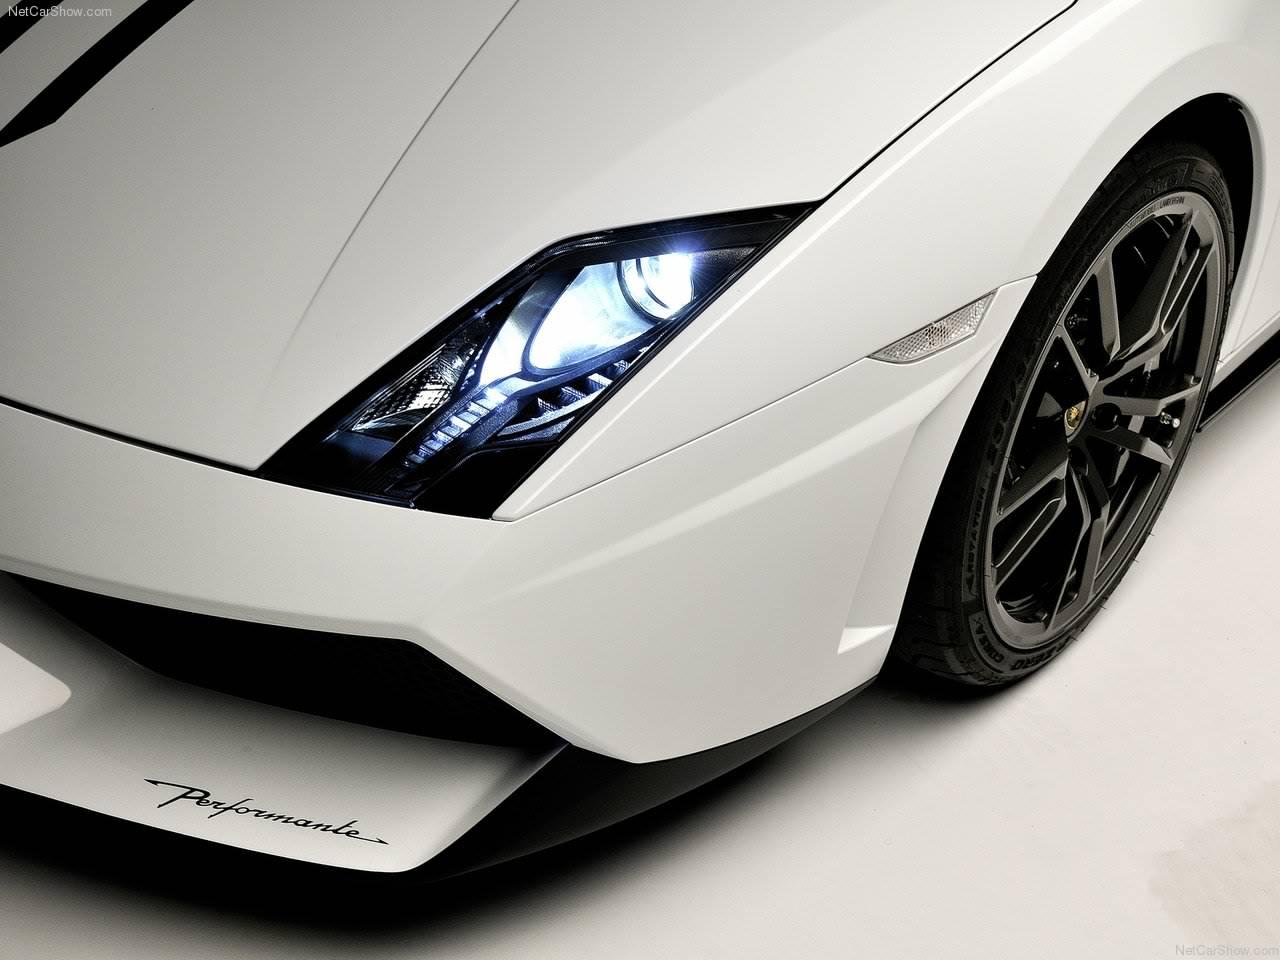 http://4.bp.blogspot.com/_lsyt_wQ2awY/TPK7W36MbpI/AAAAAAACHpg/QiumGjcy3-Q/s1600/Lamborghini-Gallardo_LP570-4_Spyder_Performante_2011_1280x960_wallpaper_08.jpg